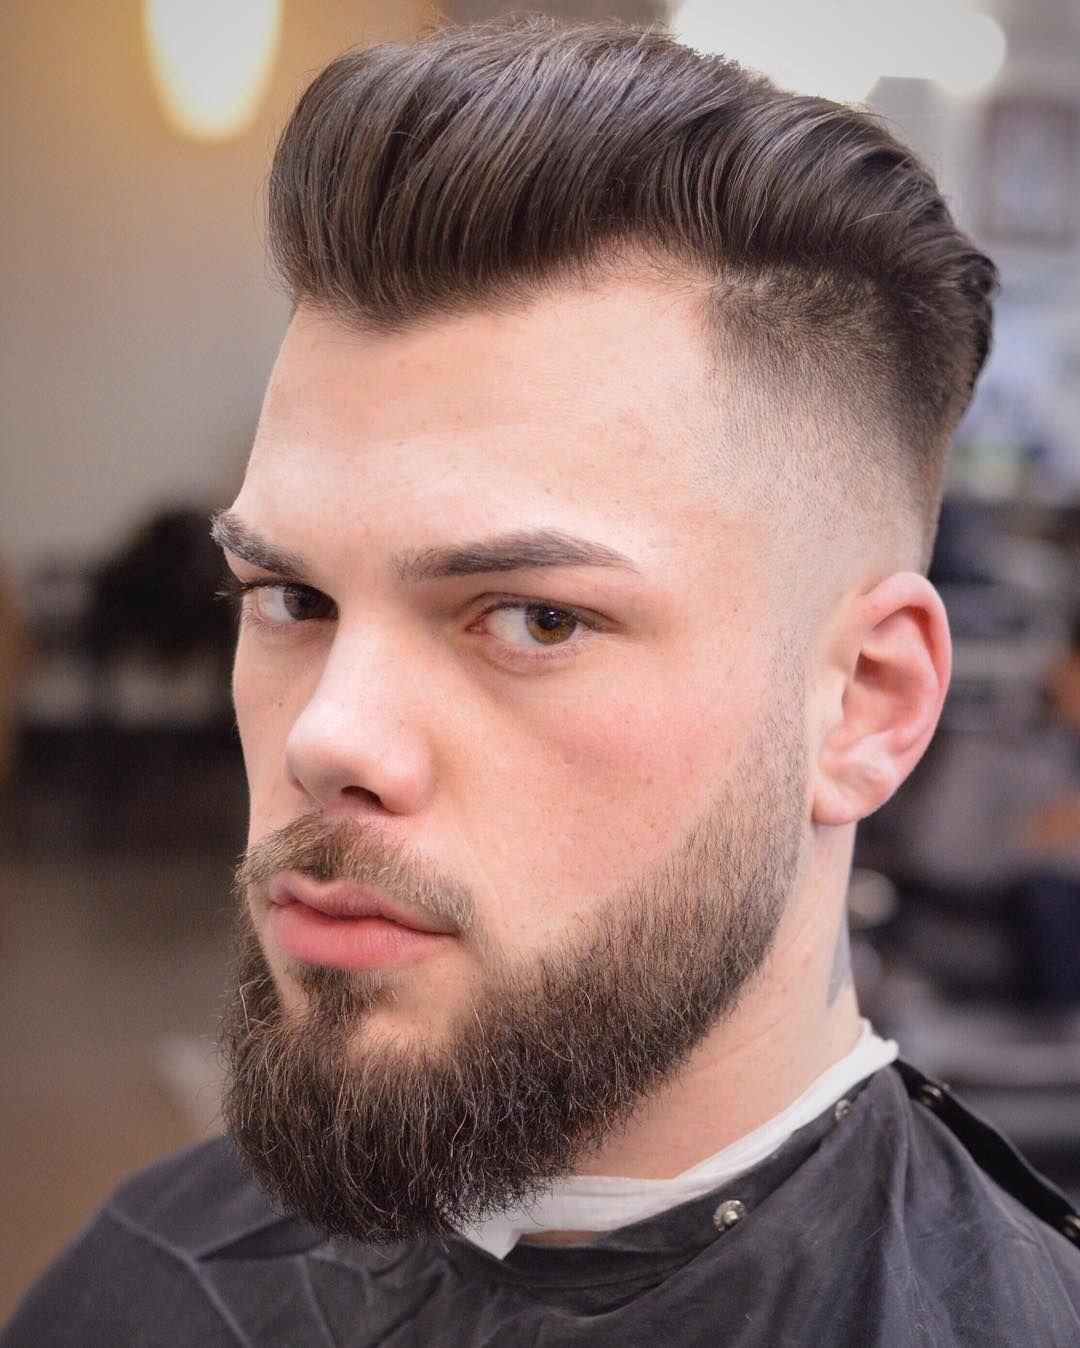 Blowout With Beard : blowout, beard, Elegant, Men's, Medium, Hairstyles, Creative, Check, Http://machohairstyles.com/bes…, Modern, Haircuts,, Haircut, Styles,, Pompadour